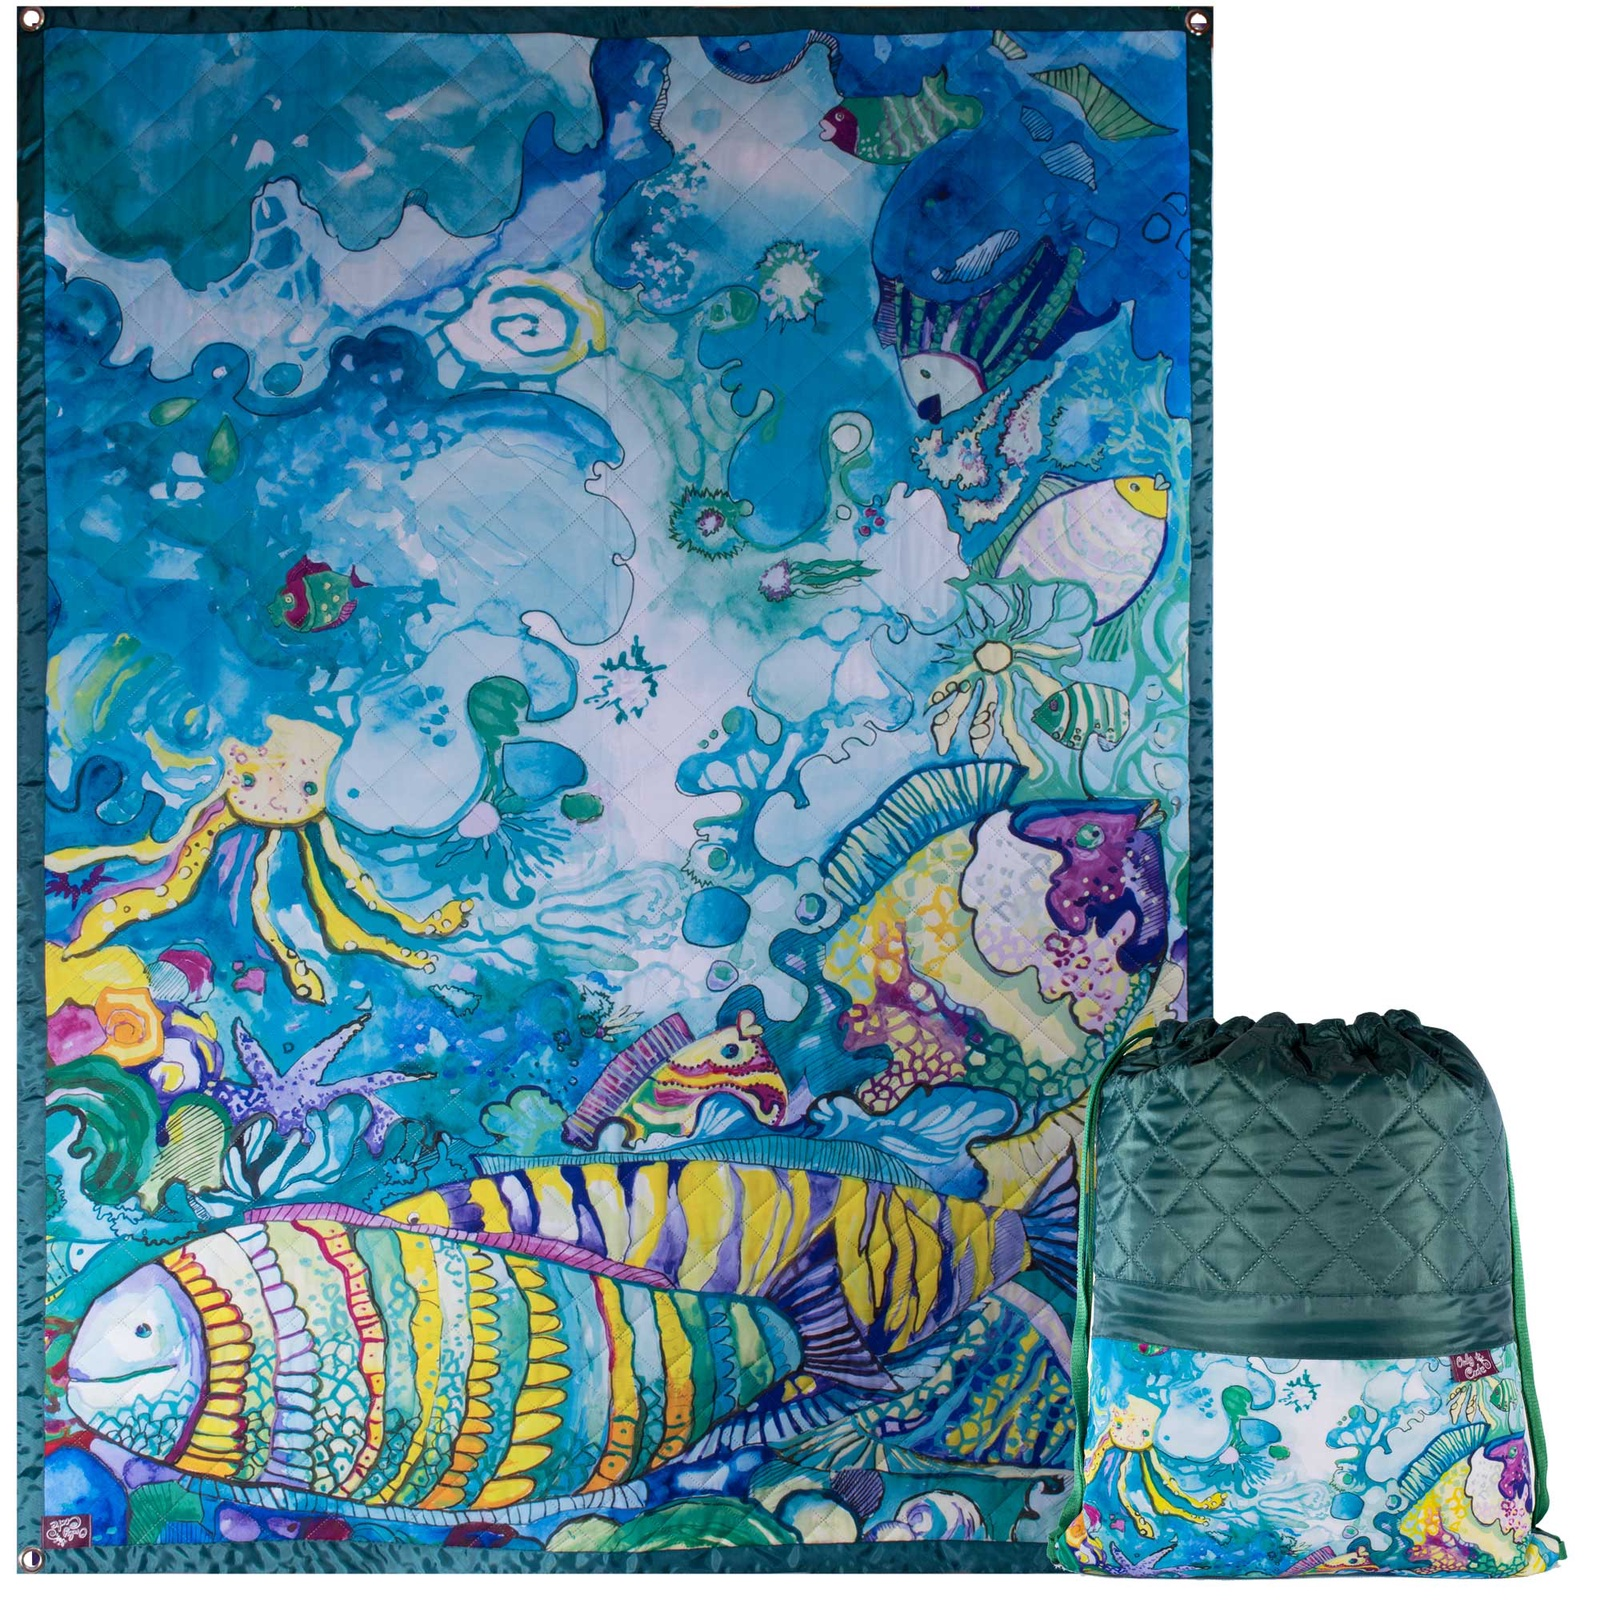 Коврик в рюкзаке OnlyCute Океанариум зеленый